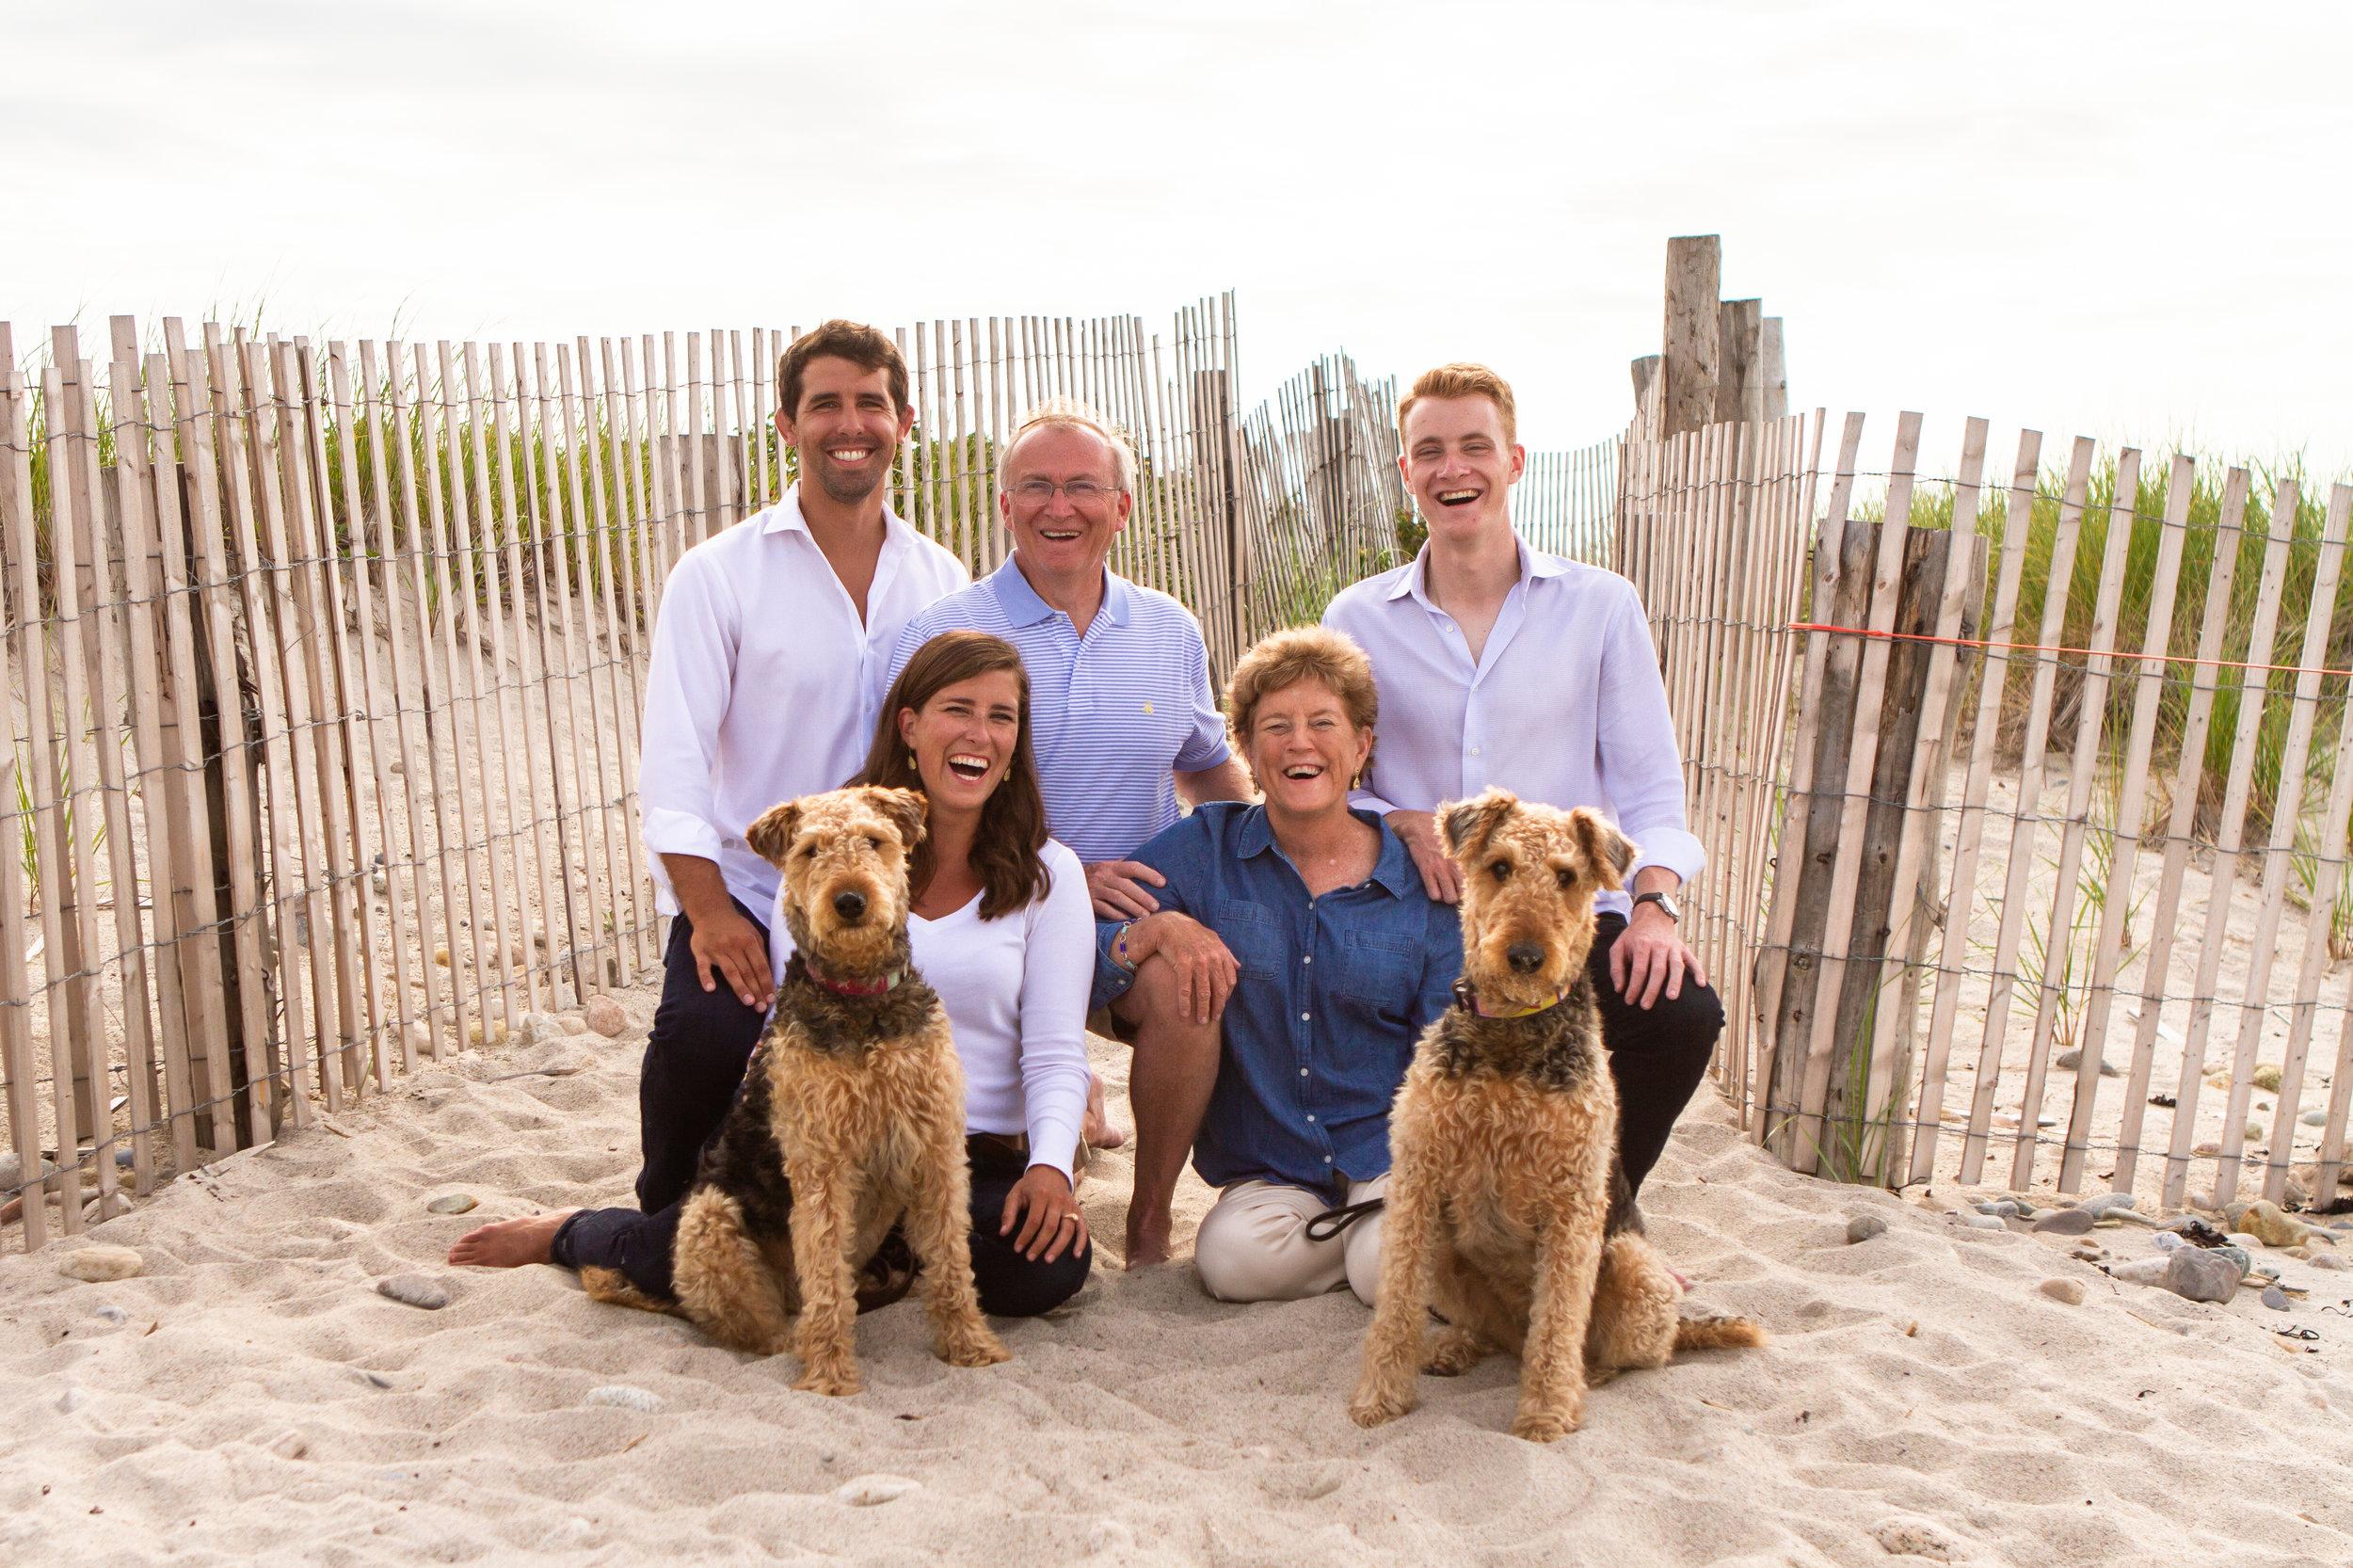 Duxbury Beach Family Photographer, Massachusetts, Scituate Family Photography